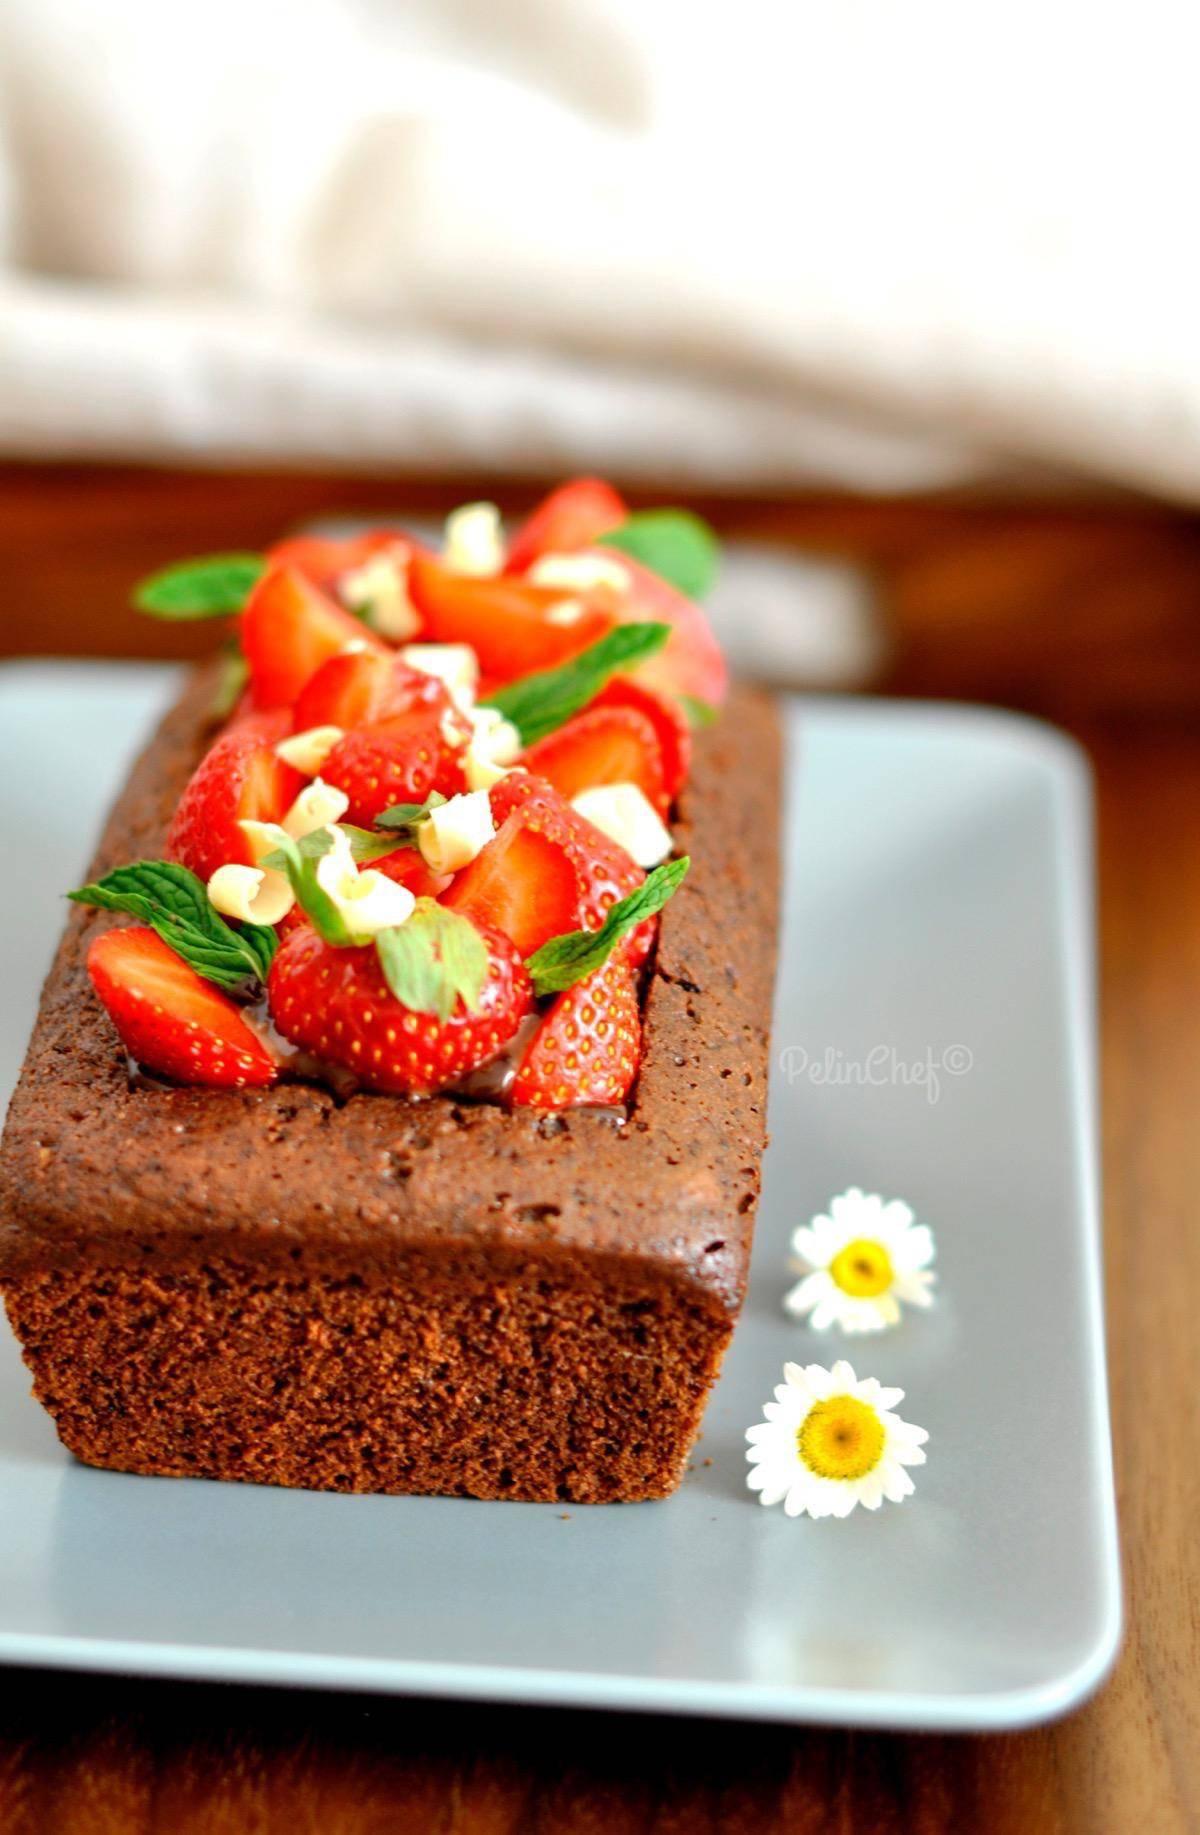 çilekli-çikolatalı-kek